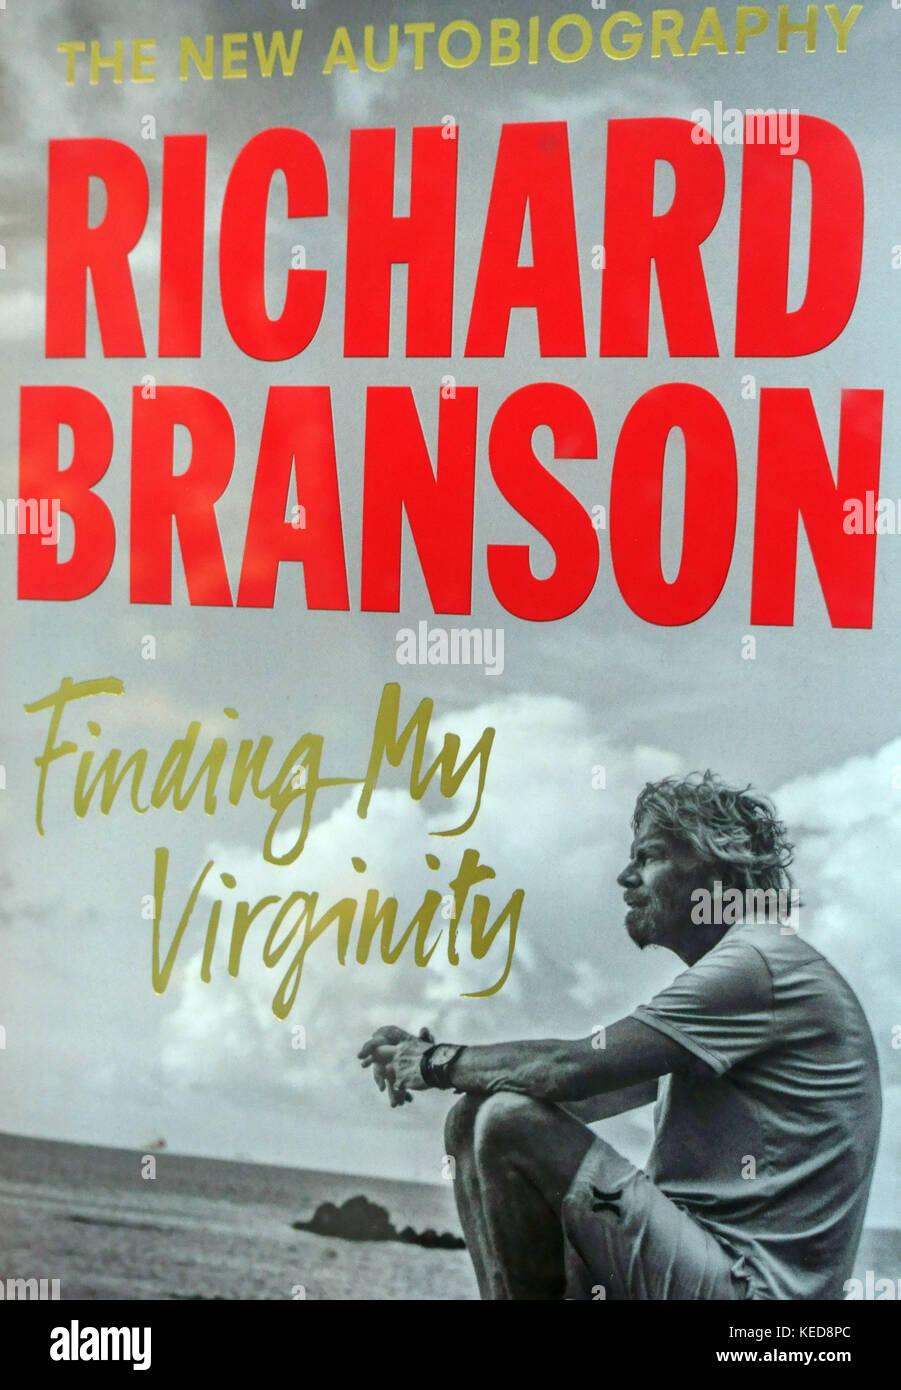 Think, richard branson virginity good, support